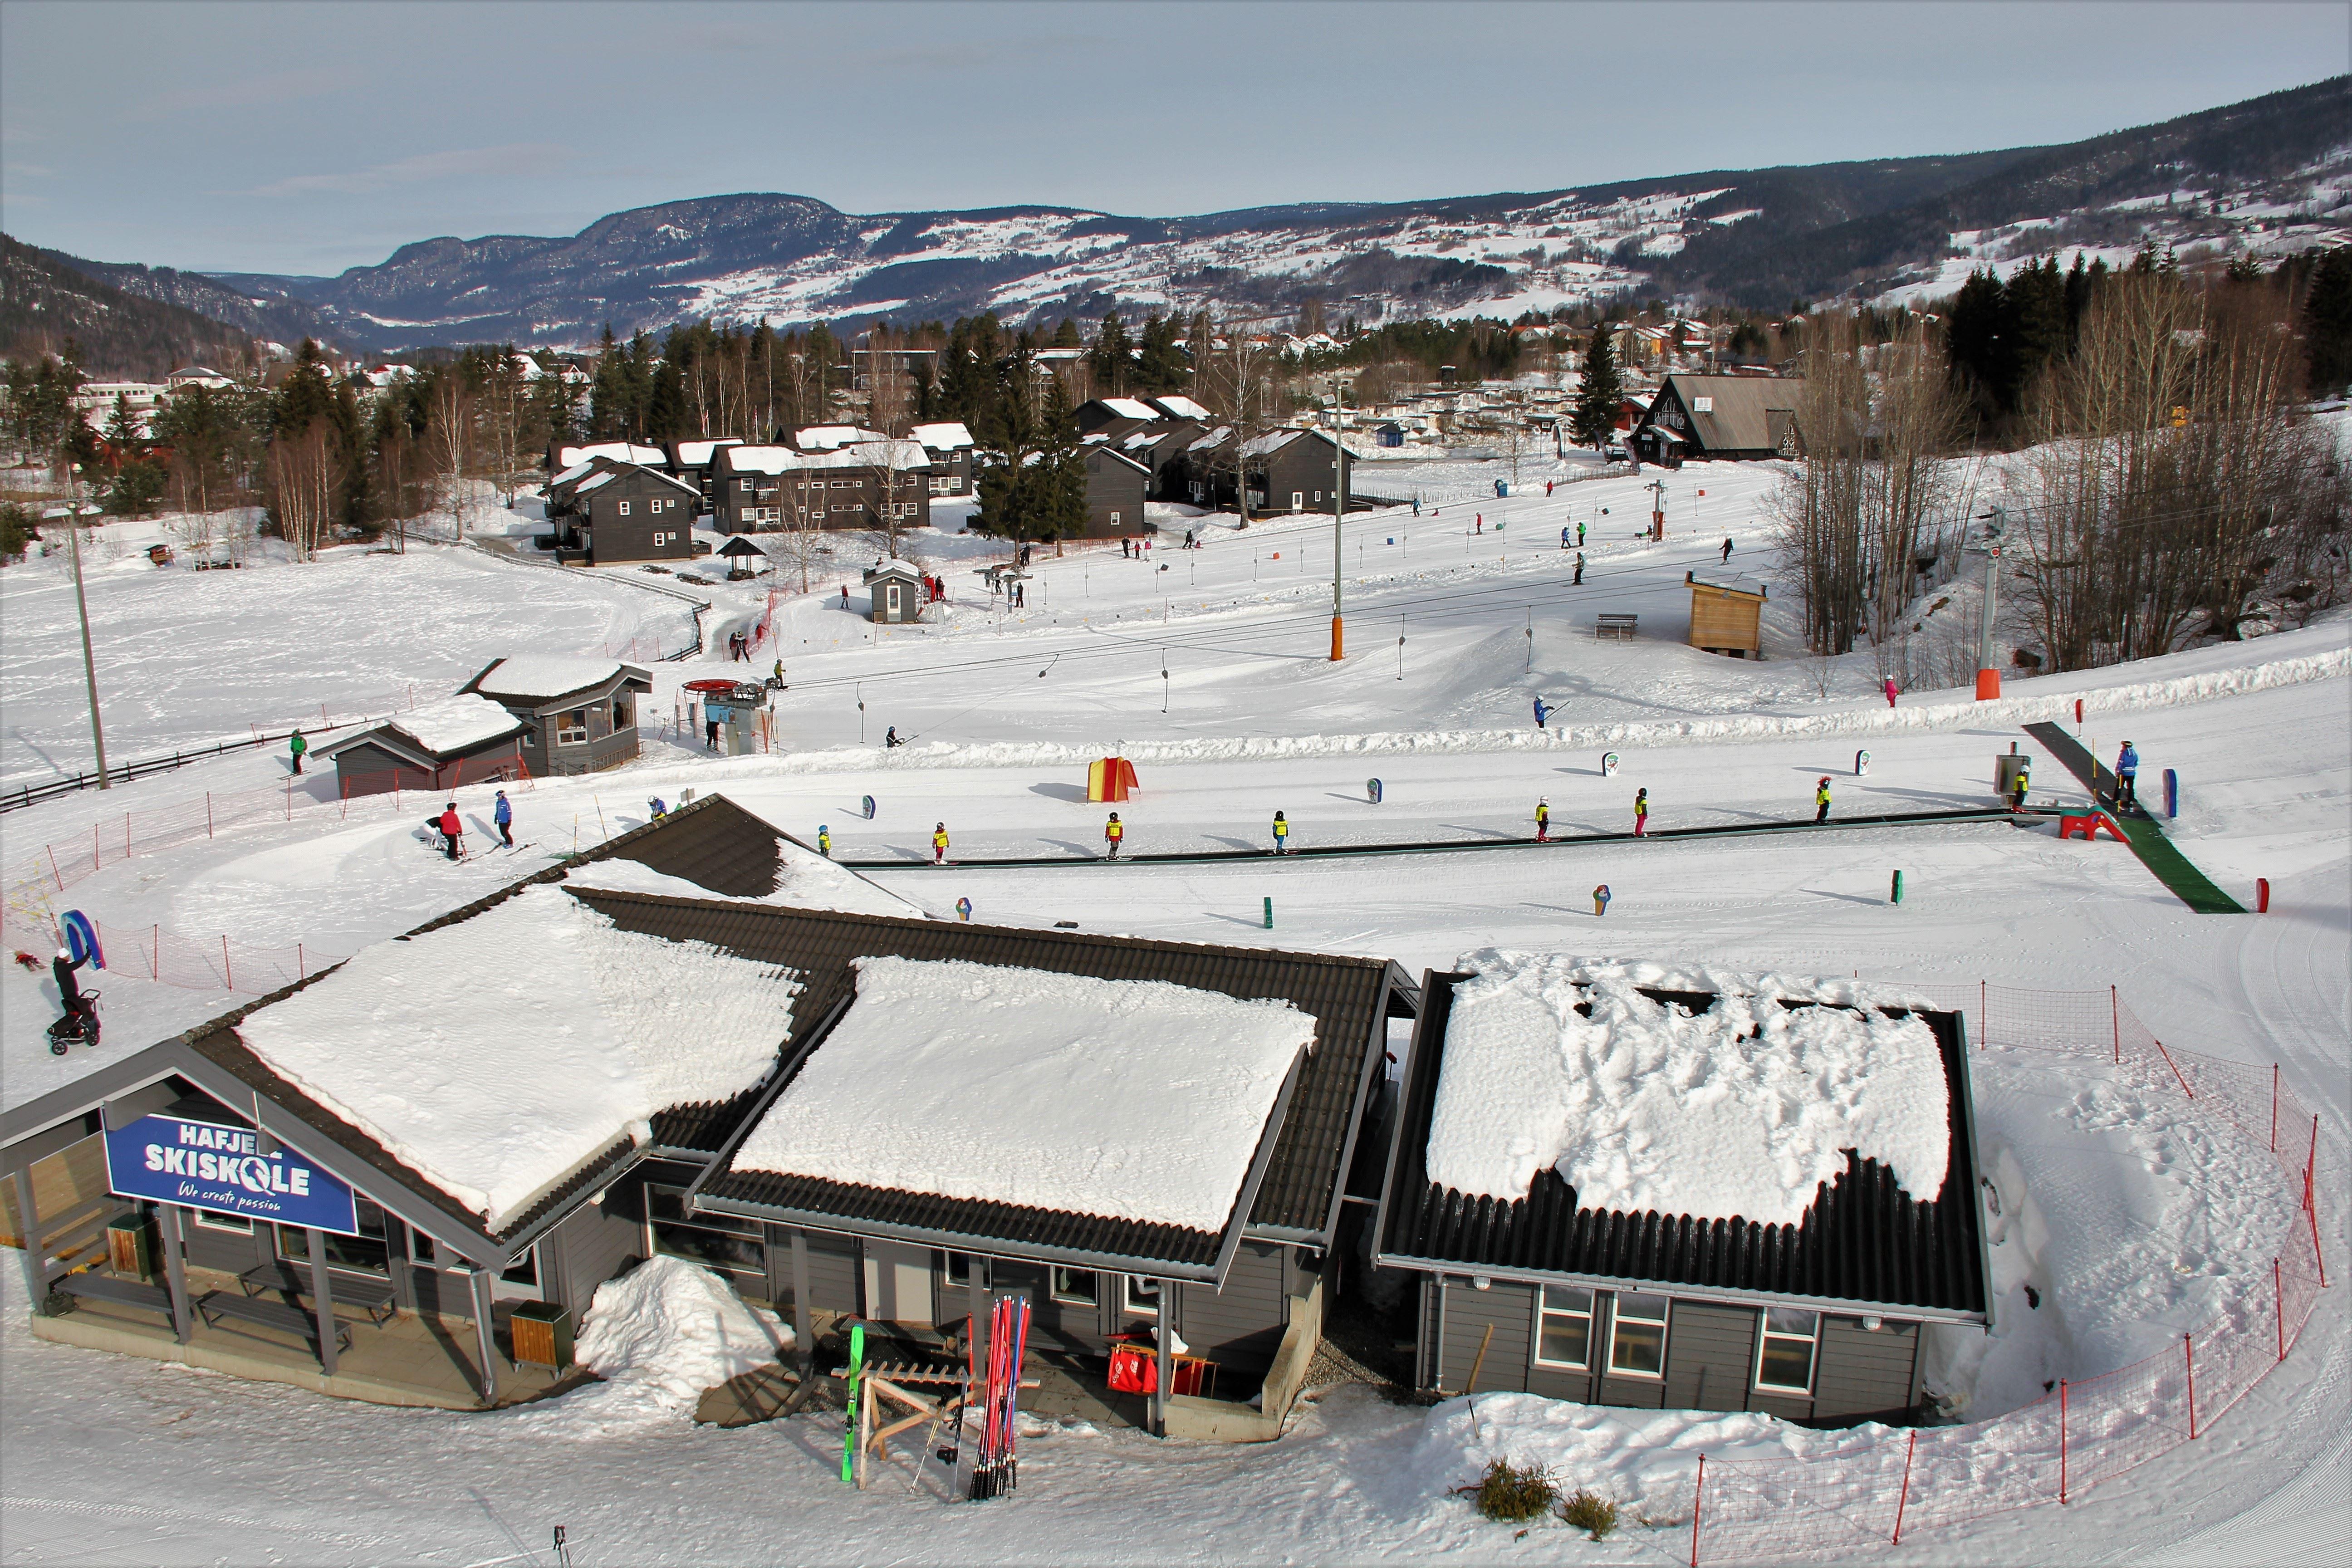 Hafjell ski school